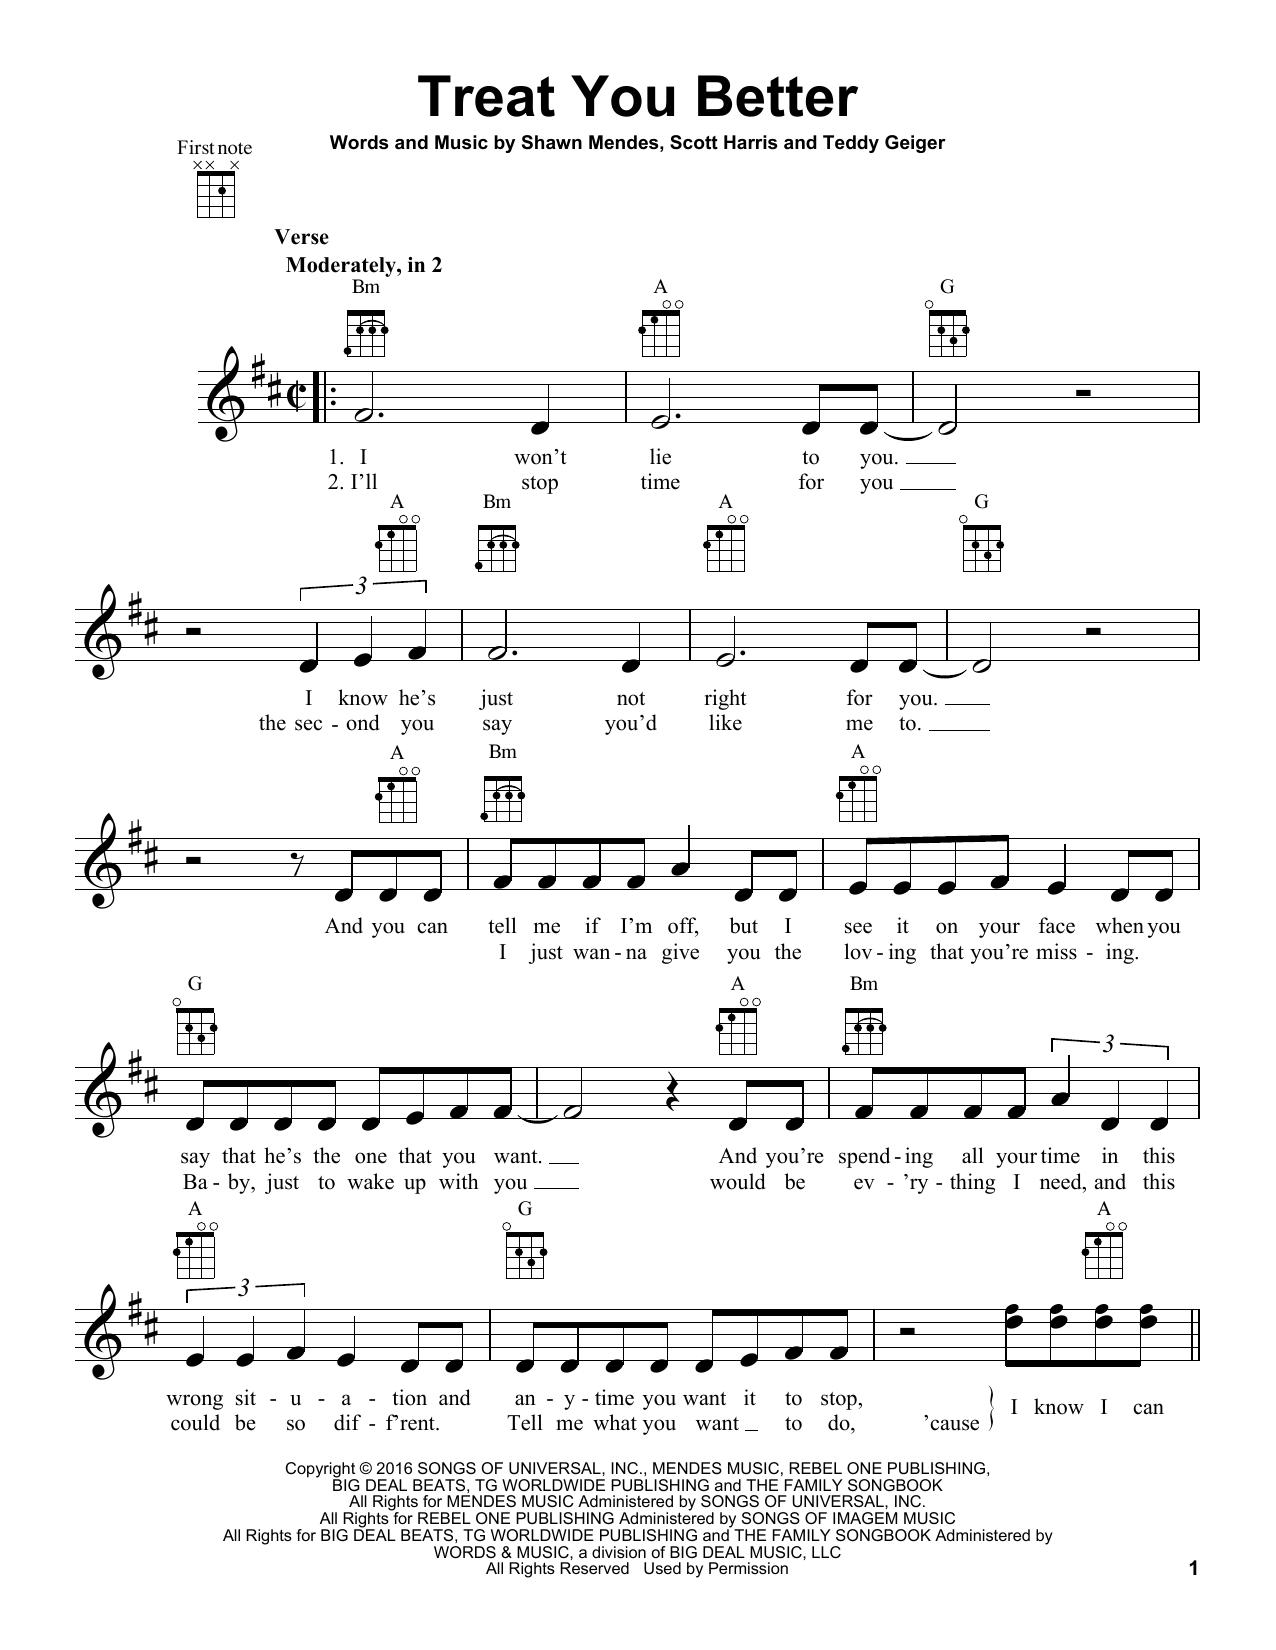 Sheet Music Digital Files To Print - Licensed Teddy Geiger